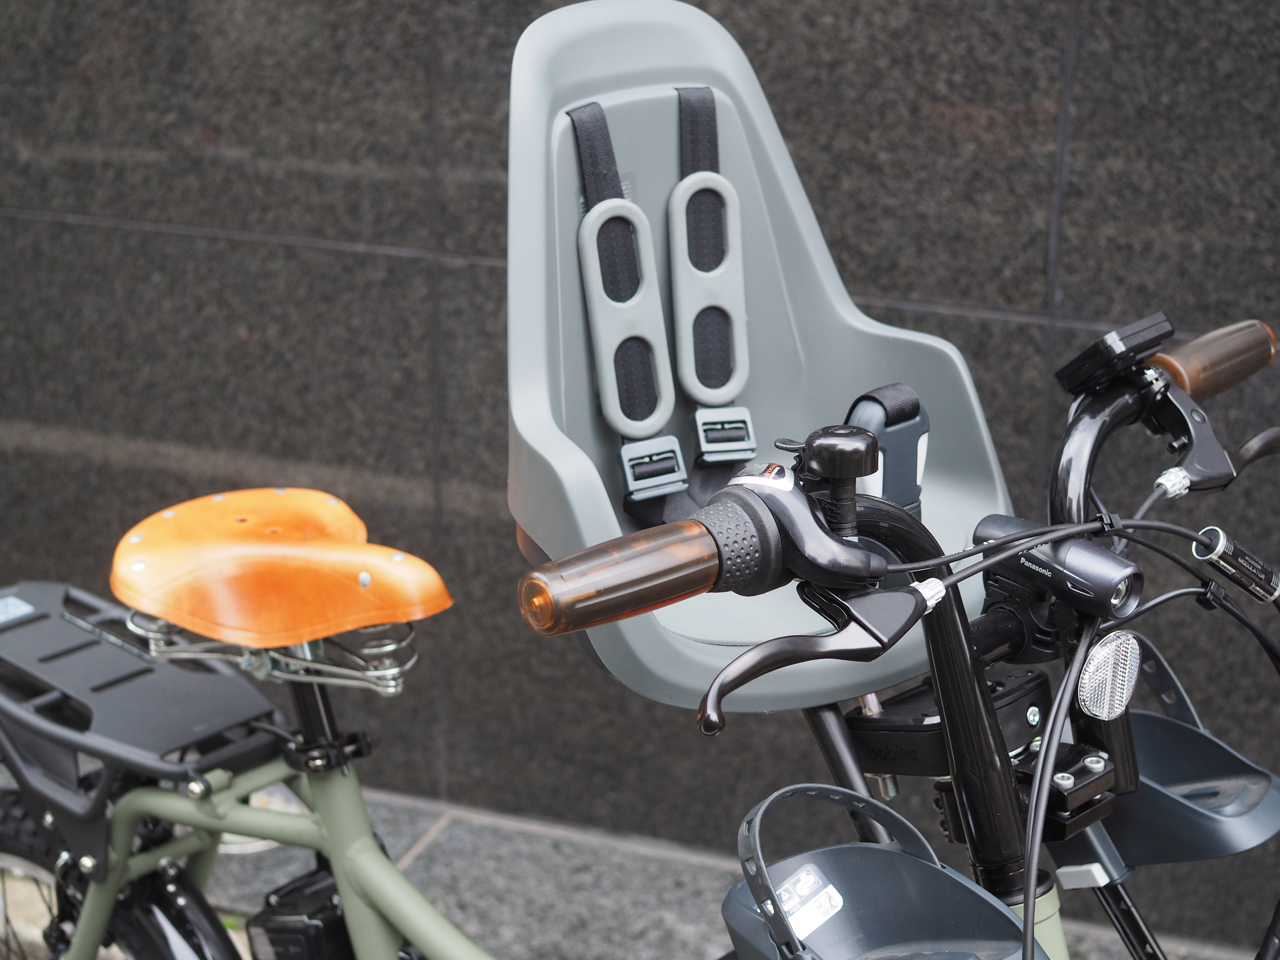 EZ,bobike,bobikeone,イーゼット,ボバイク,EZカスタム,パナソニック,電動自転車,子乗せ自転車